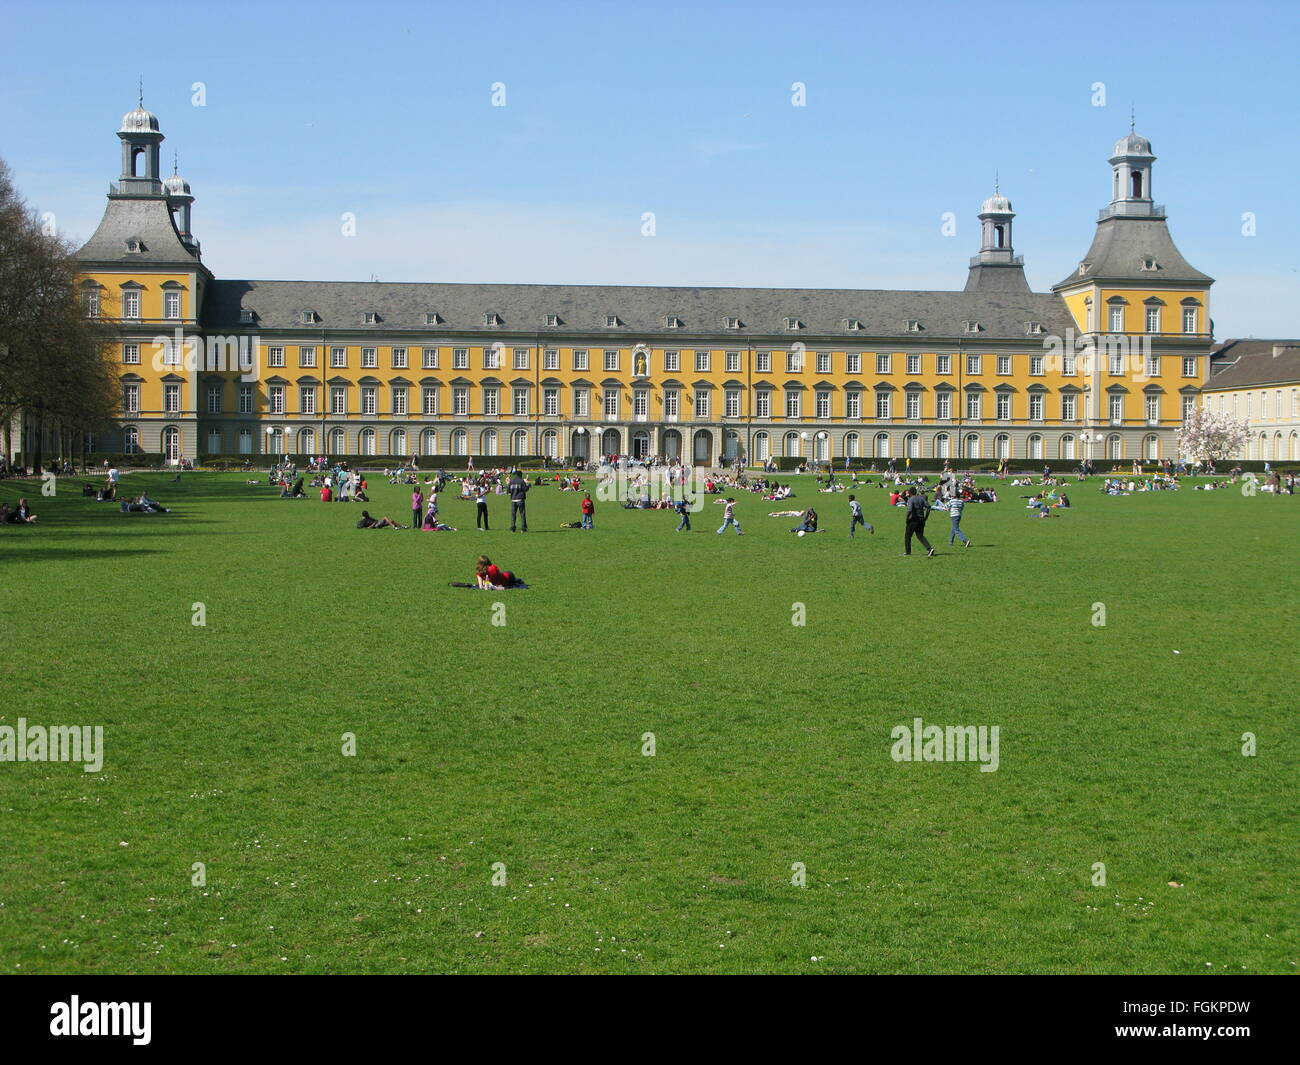 University, Bonn, Germany - Stock Image